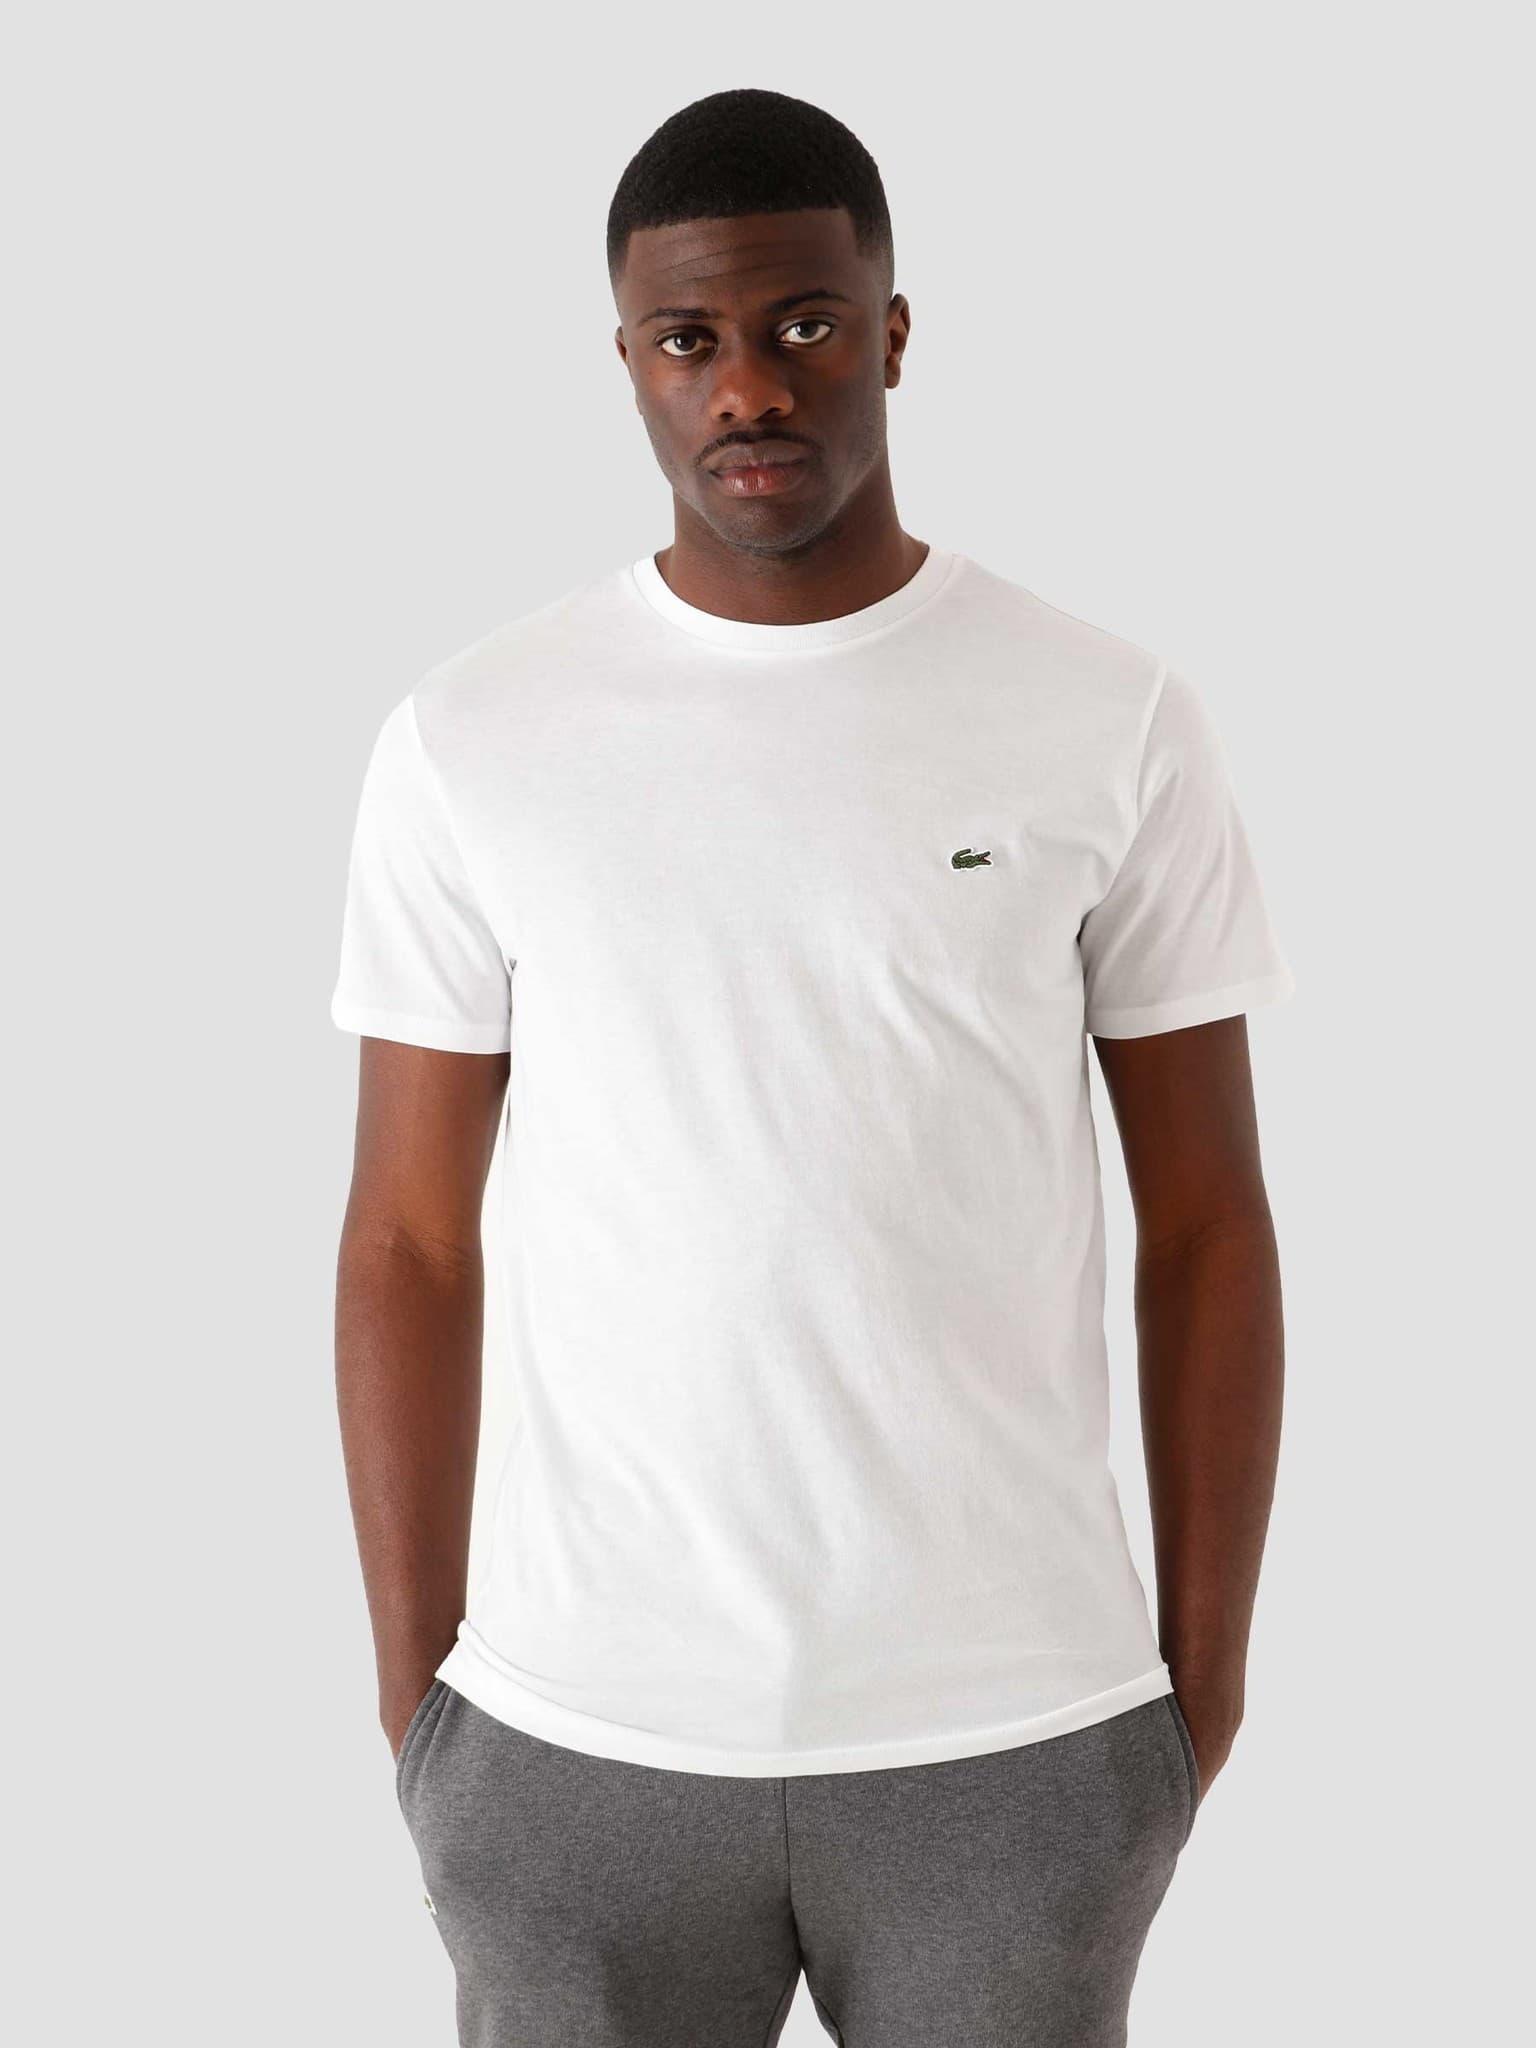 1HT1 Men's T-Shirt White TH6709-11